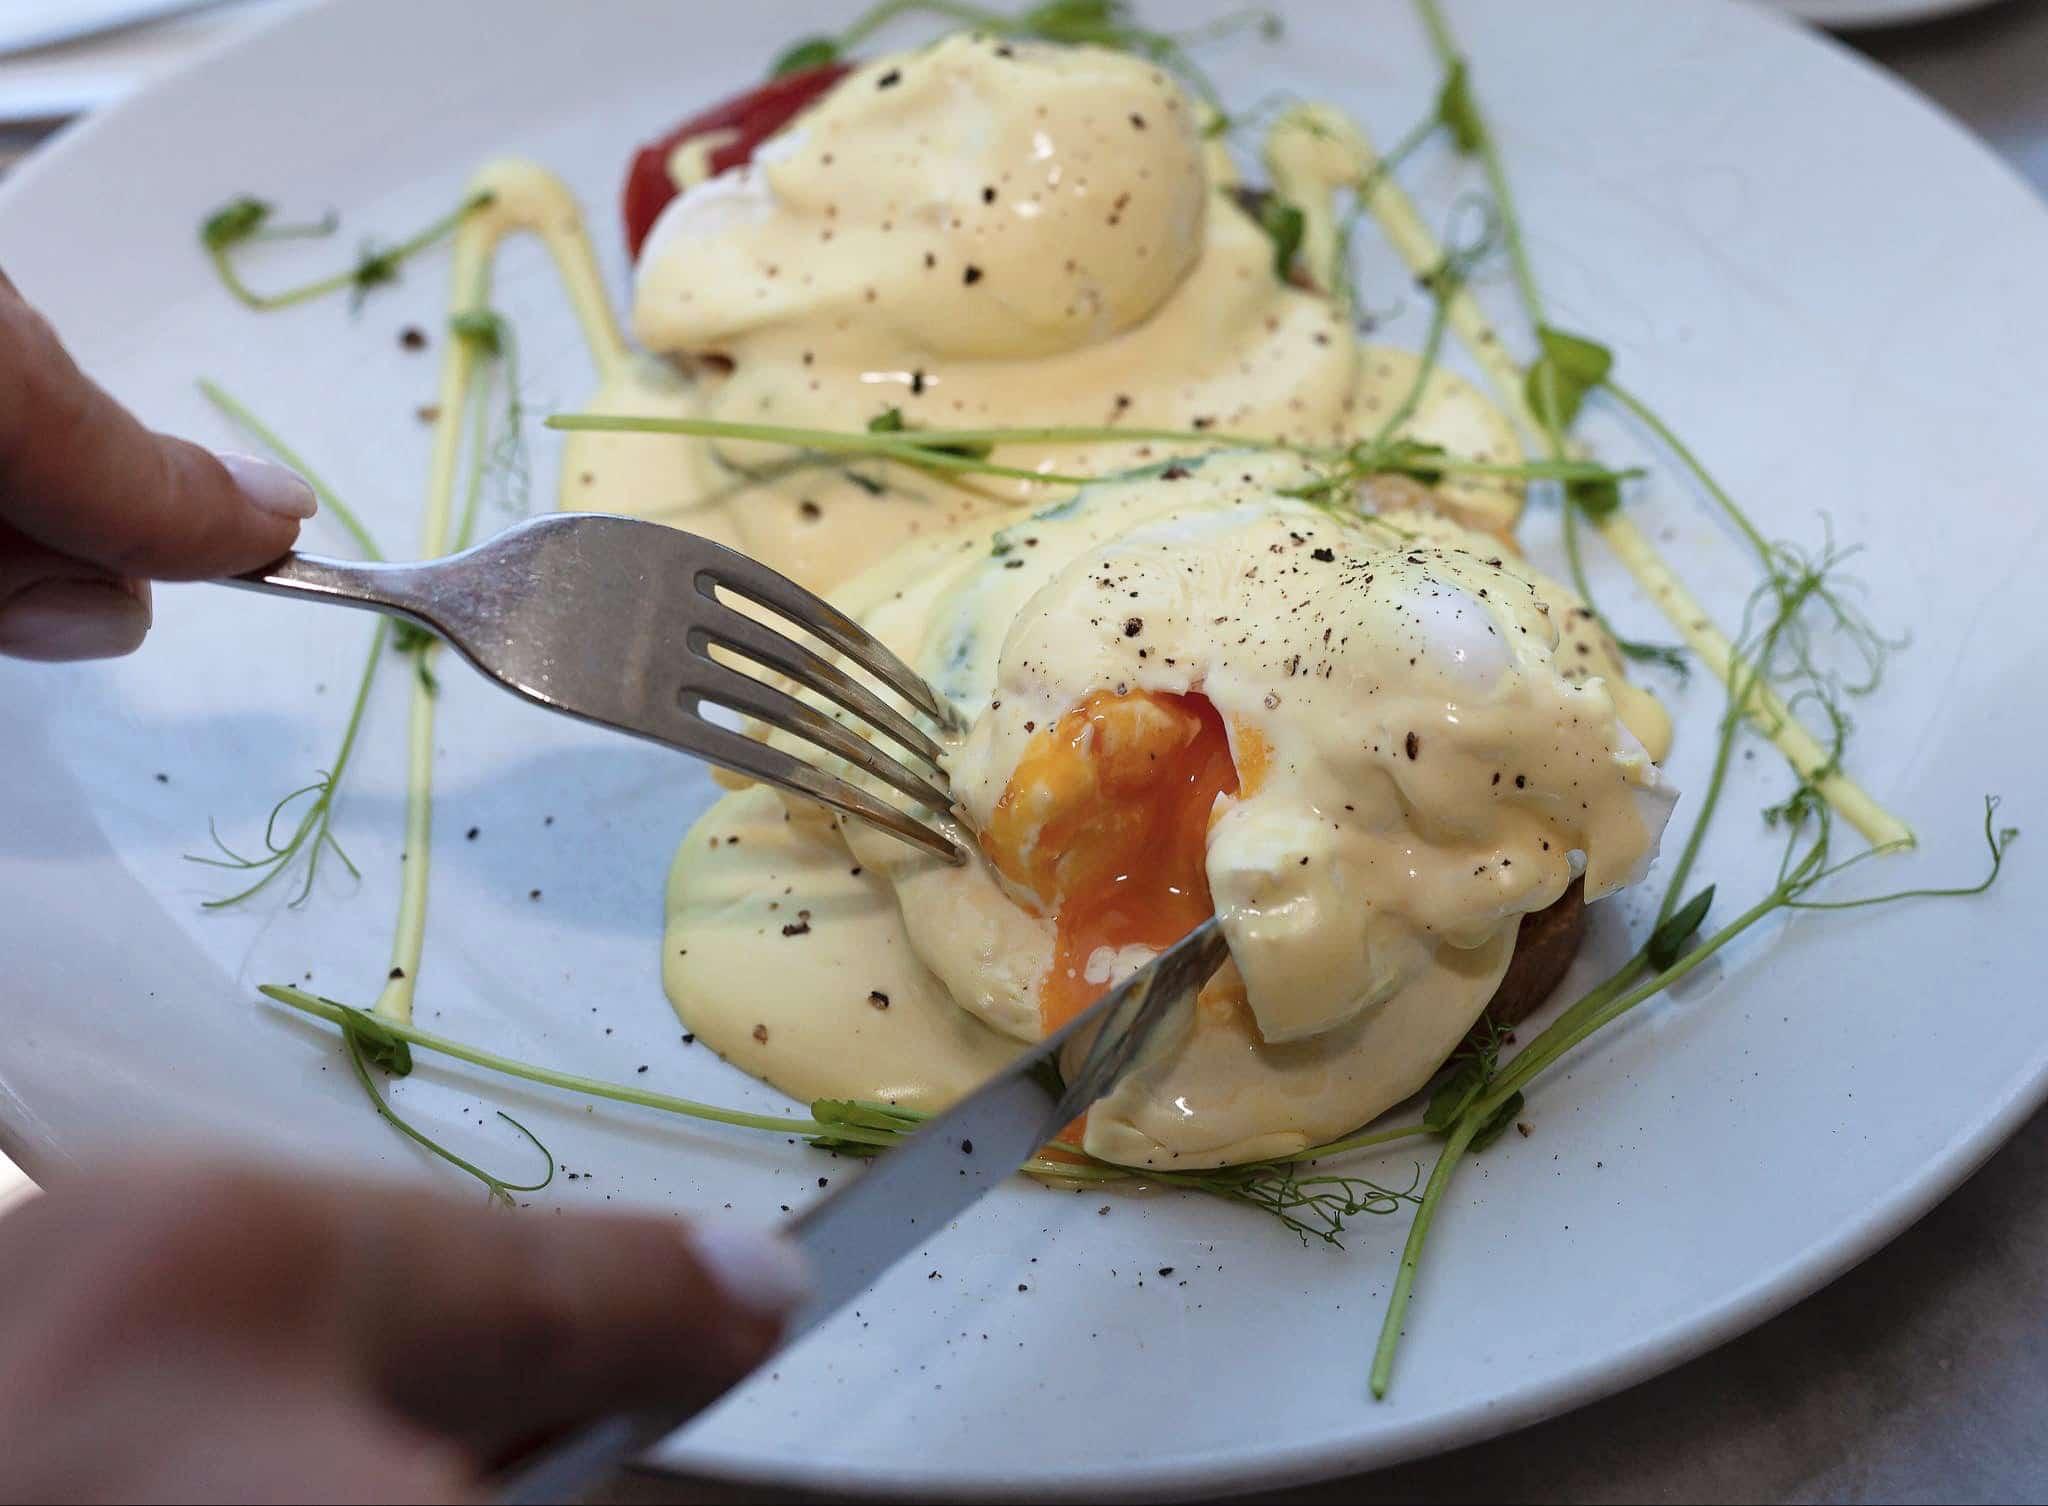 Bár így menne otthon is: À la Maison Grand reggelire, ebédre, uzsonnára